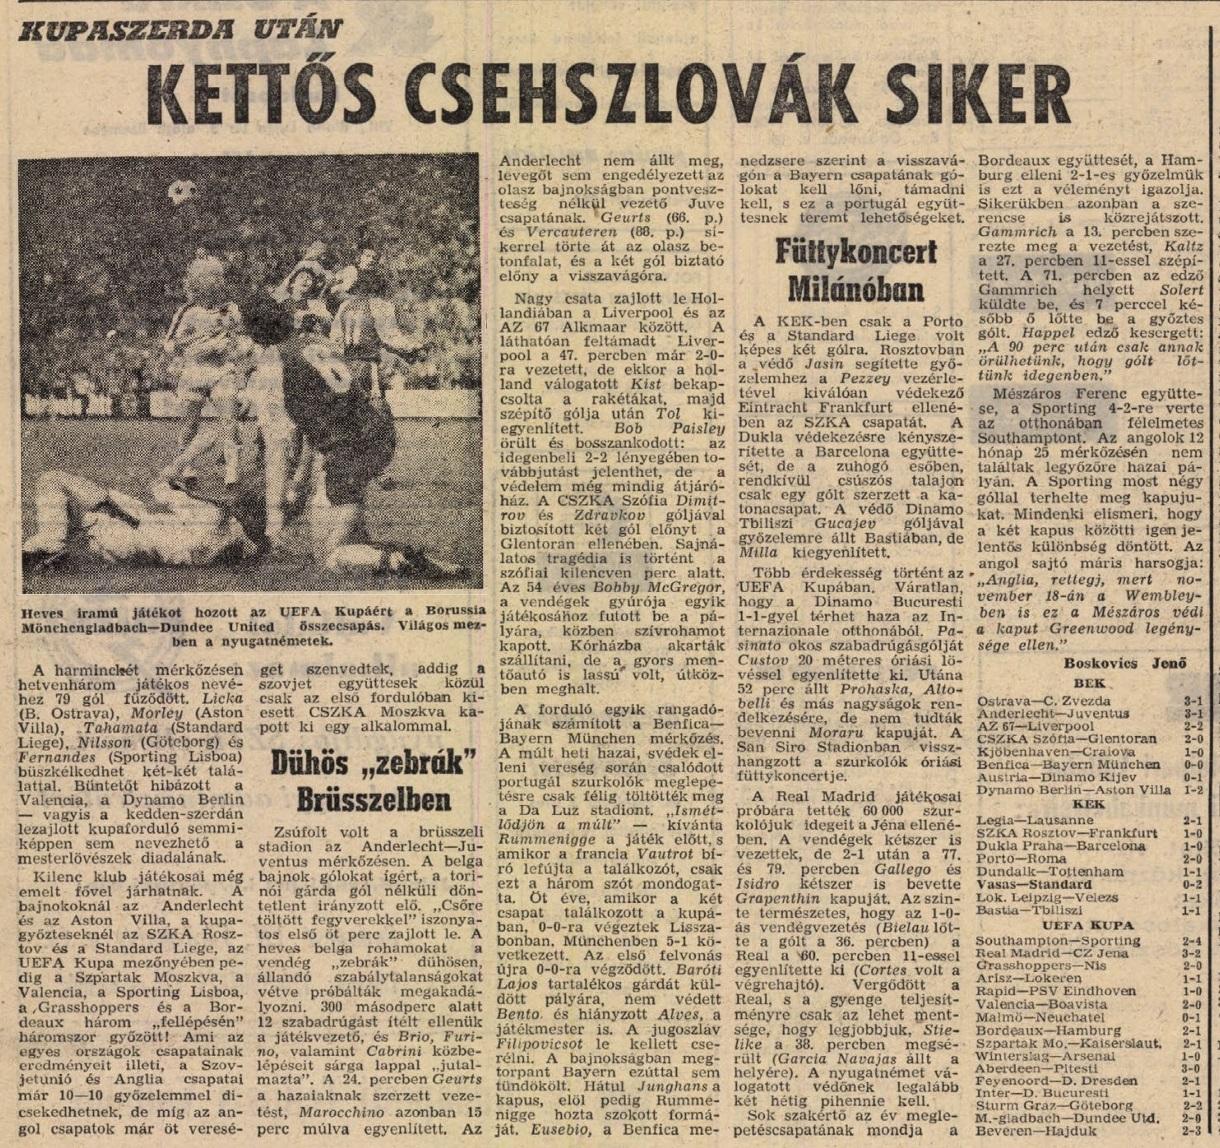 idokapszula_nb_i_1981_82_klubcsapataink_nemzetkozi_kupaszereplese_2_fordulo_1_kor_kupaszerda.jpg